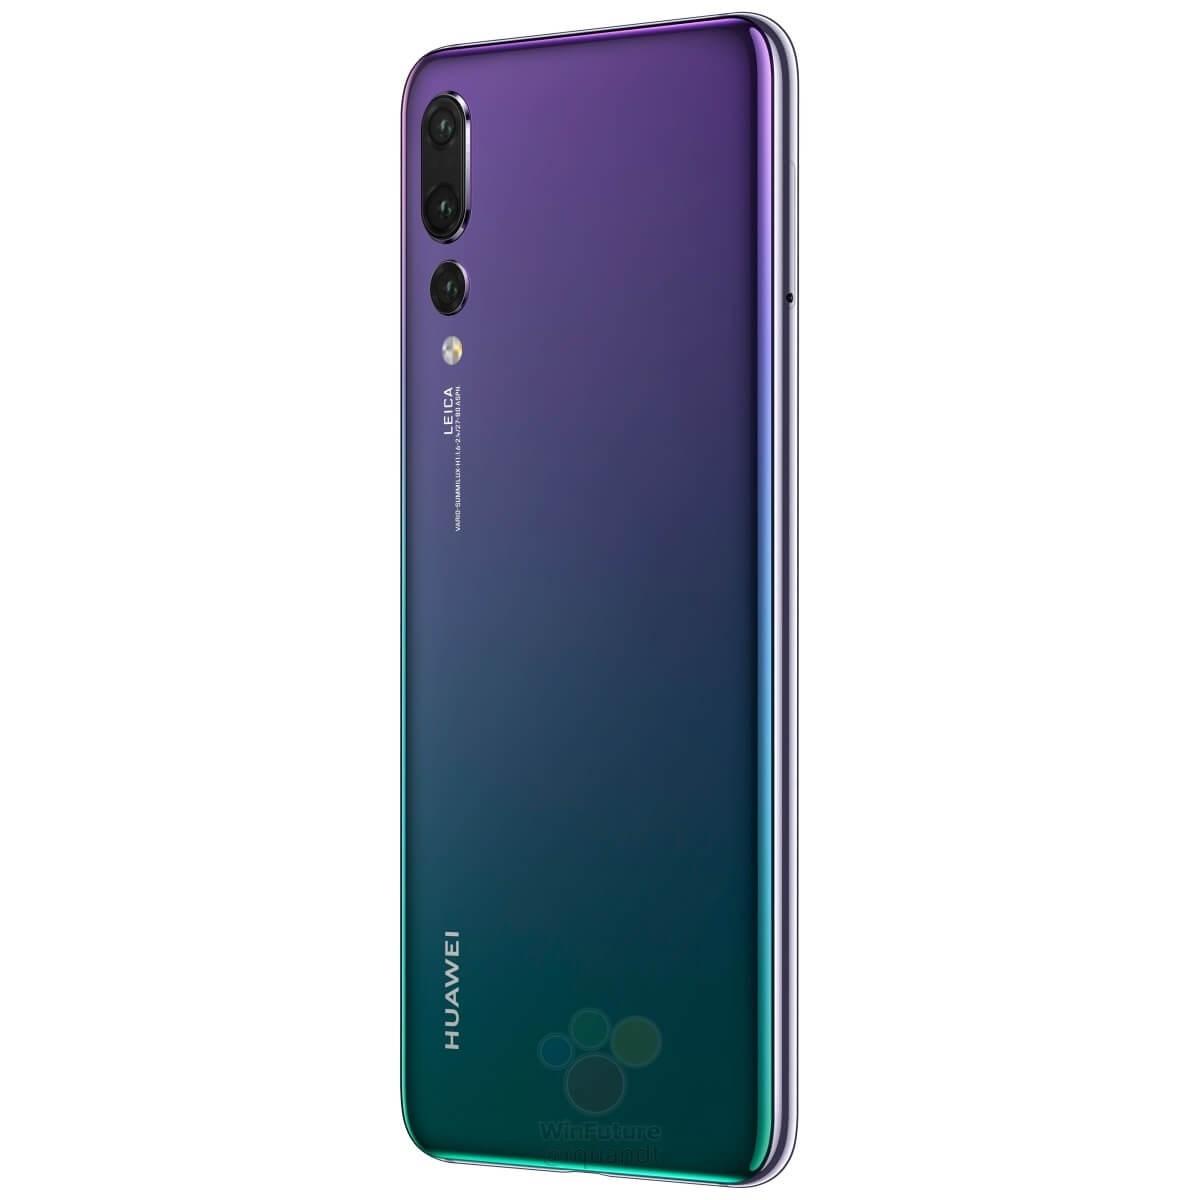 Huawei P20 Pro получит тройную камеру с модулем на 40 мегапикселей1